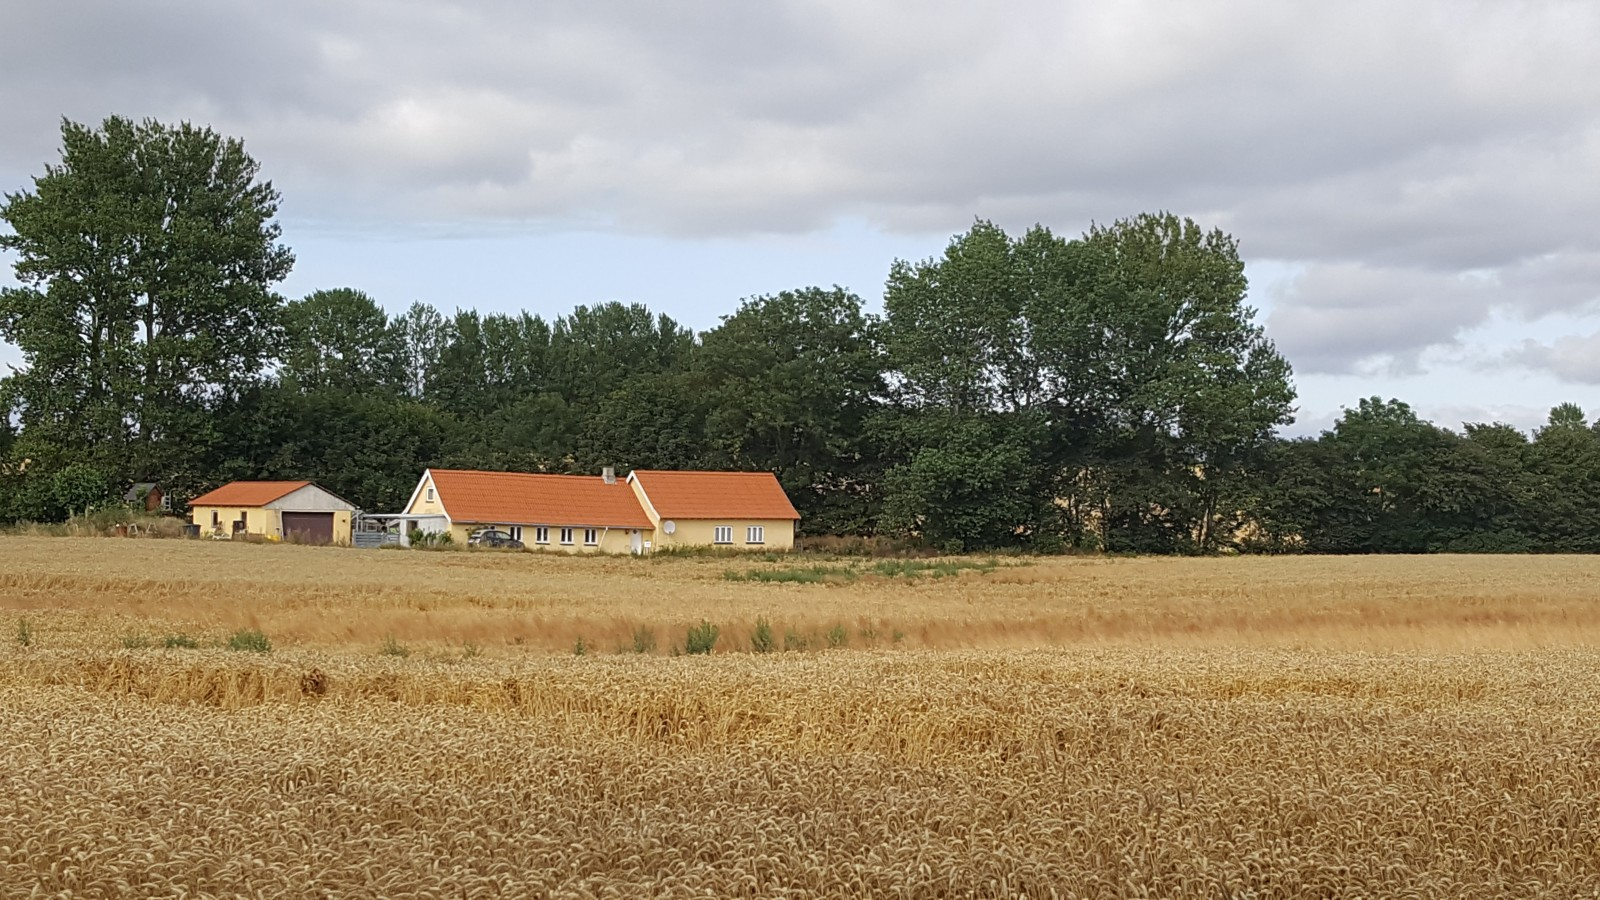 Denmark in summer!